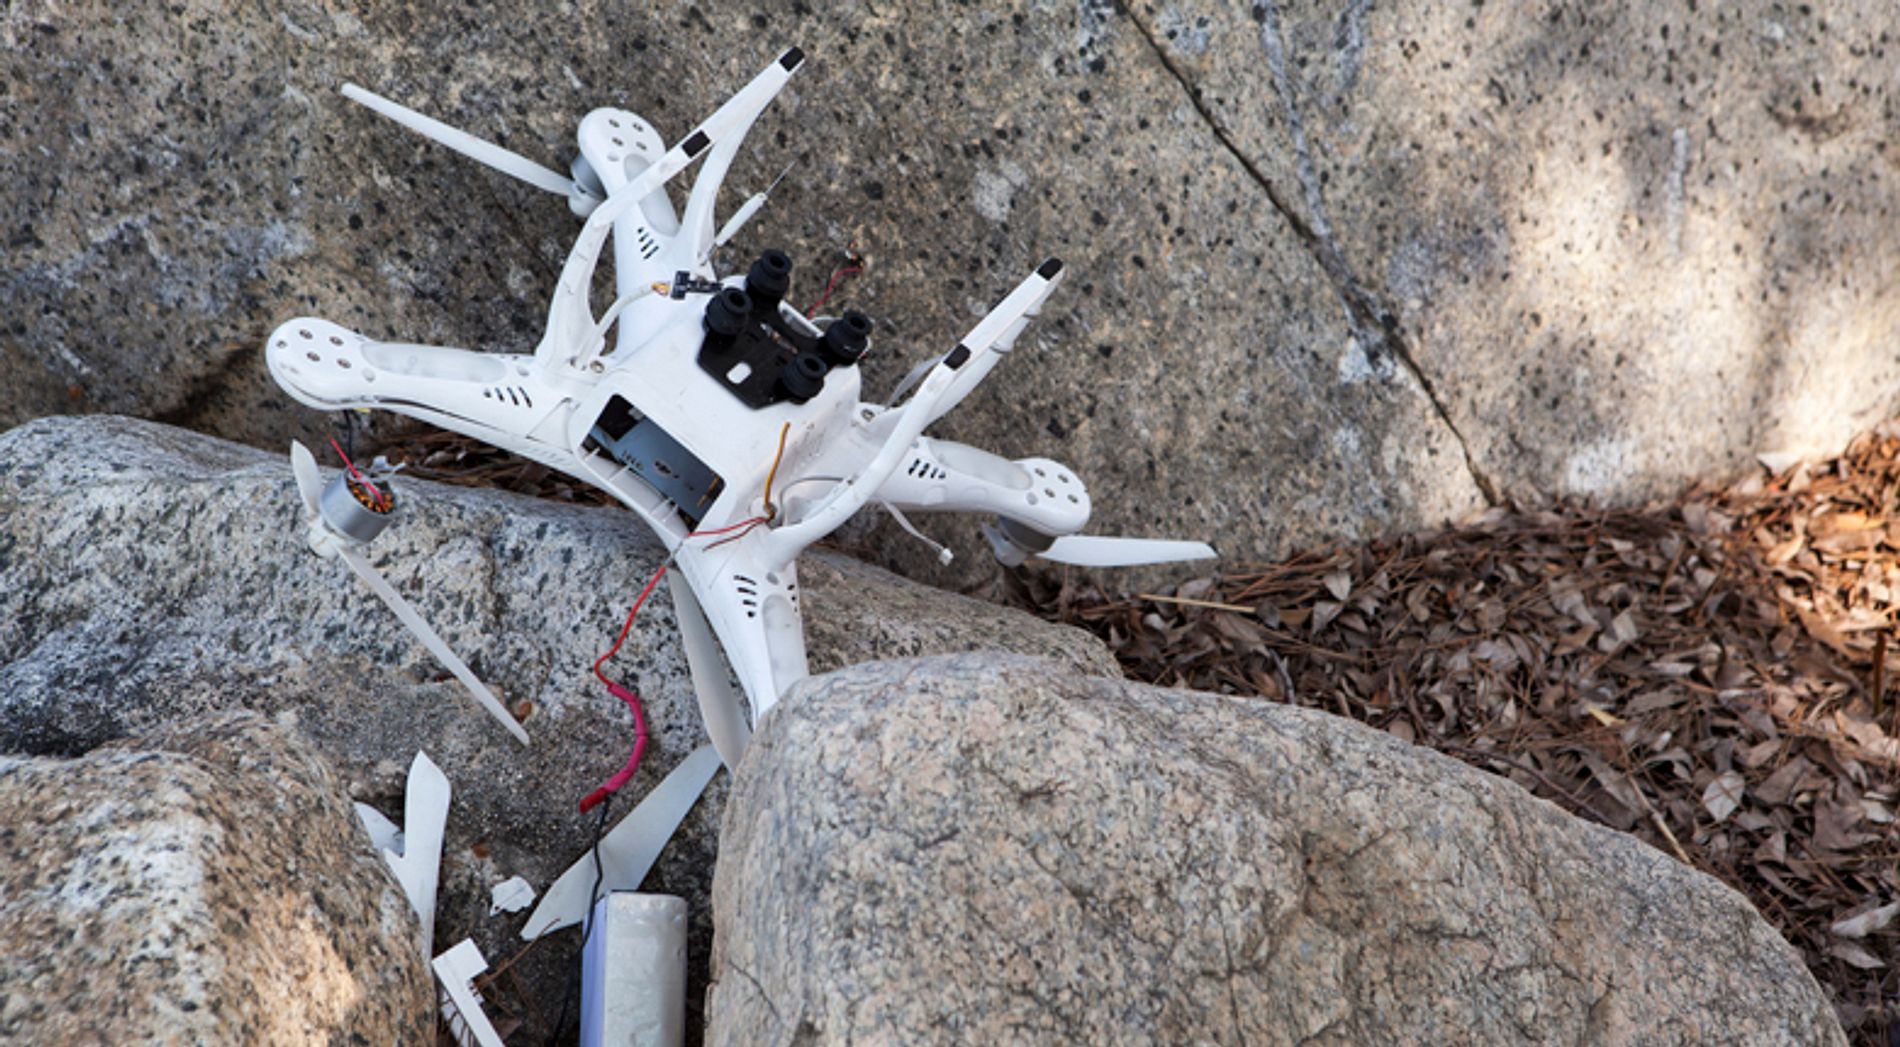 Crashed drone laying on rocks